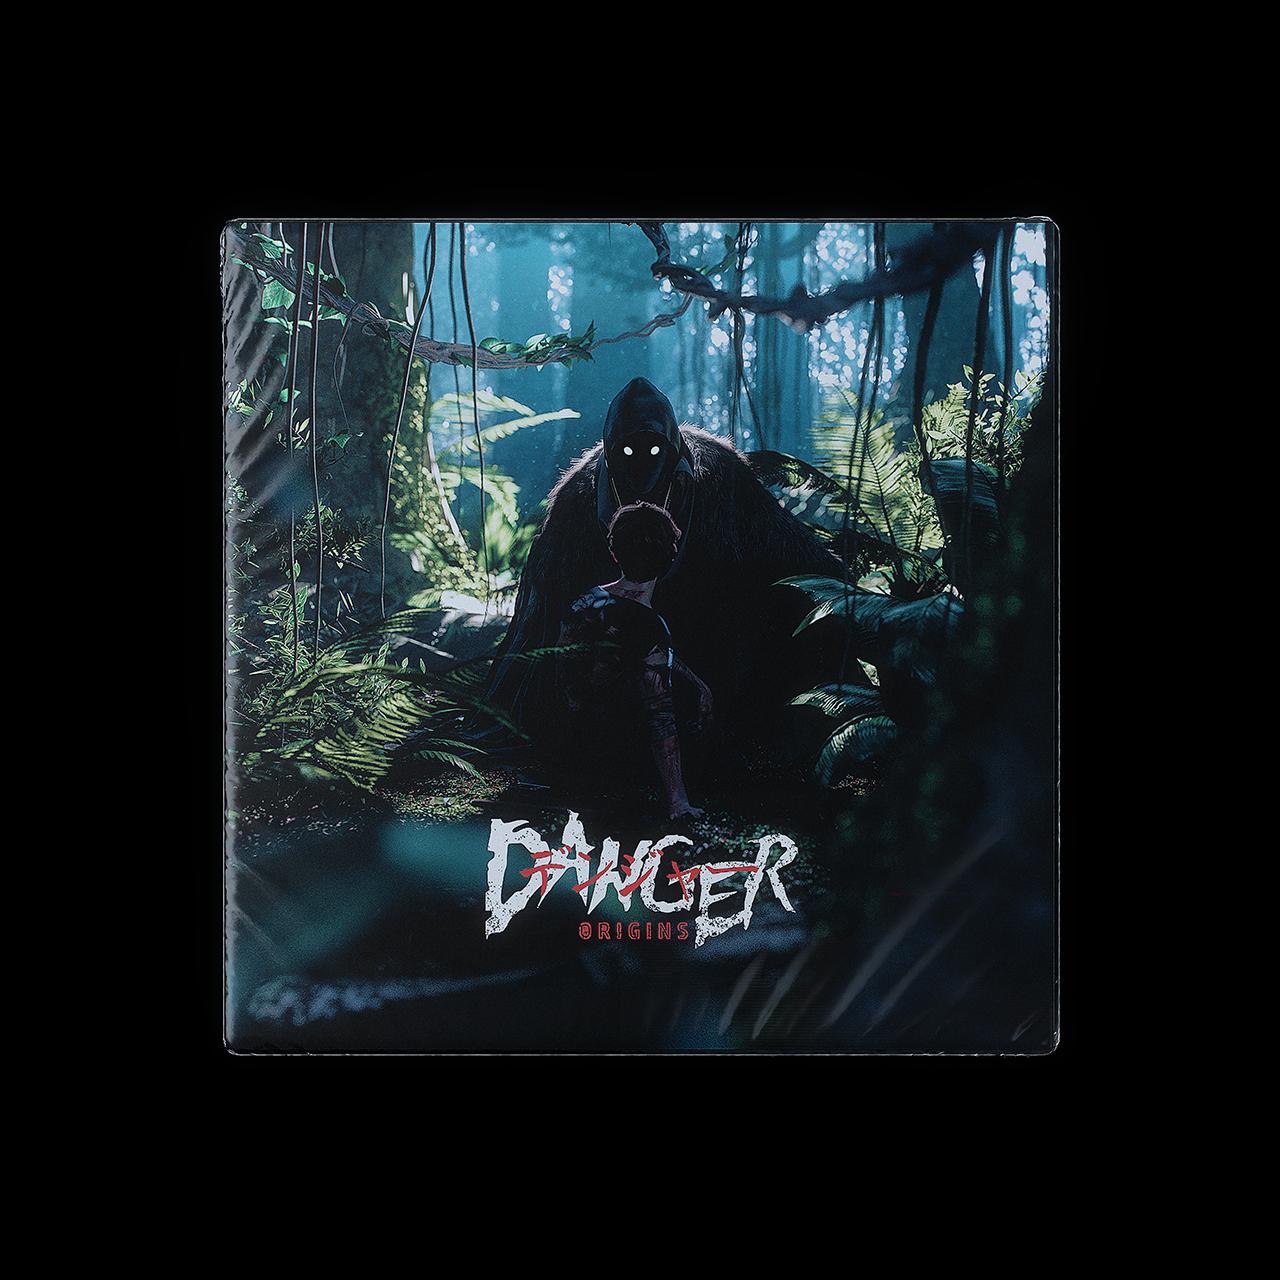 Danger - Origins LP ▲ Out January 18 2019 [Pre-Order] 12